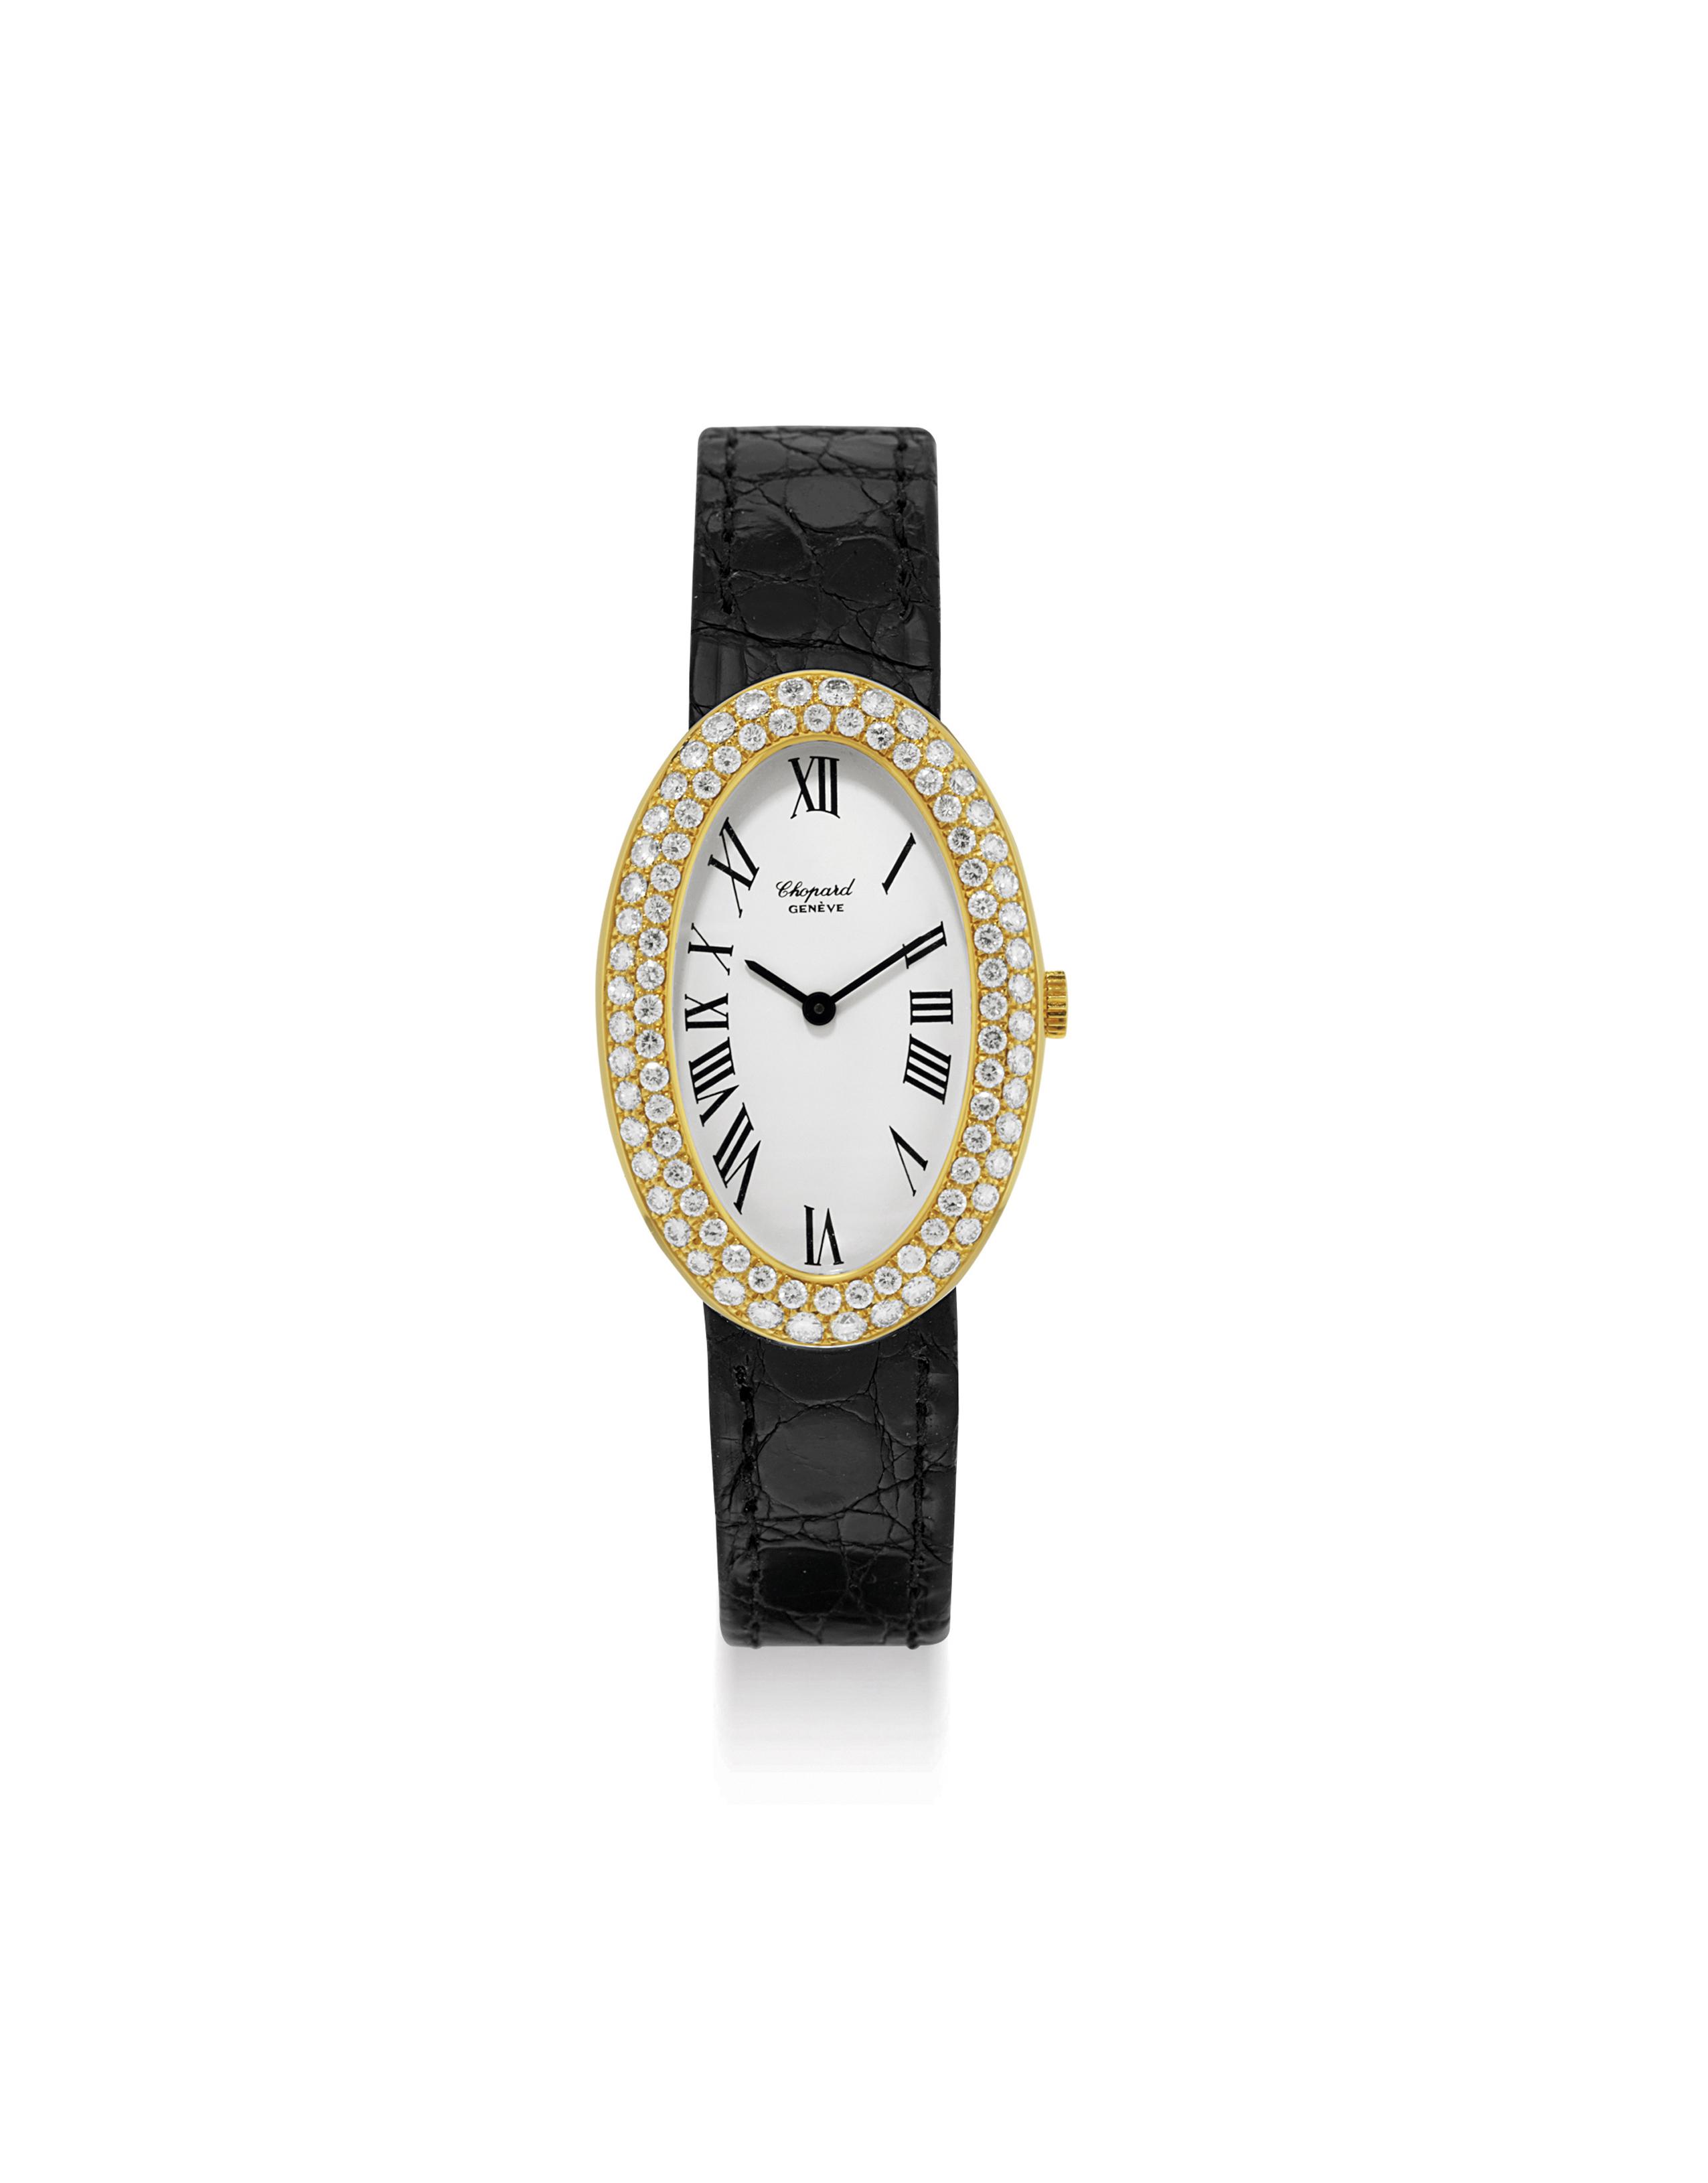 CHOPARD. A LADY'S FINE 18K GOLD AND DIAMOND-SET OVAL WRISTWATCH